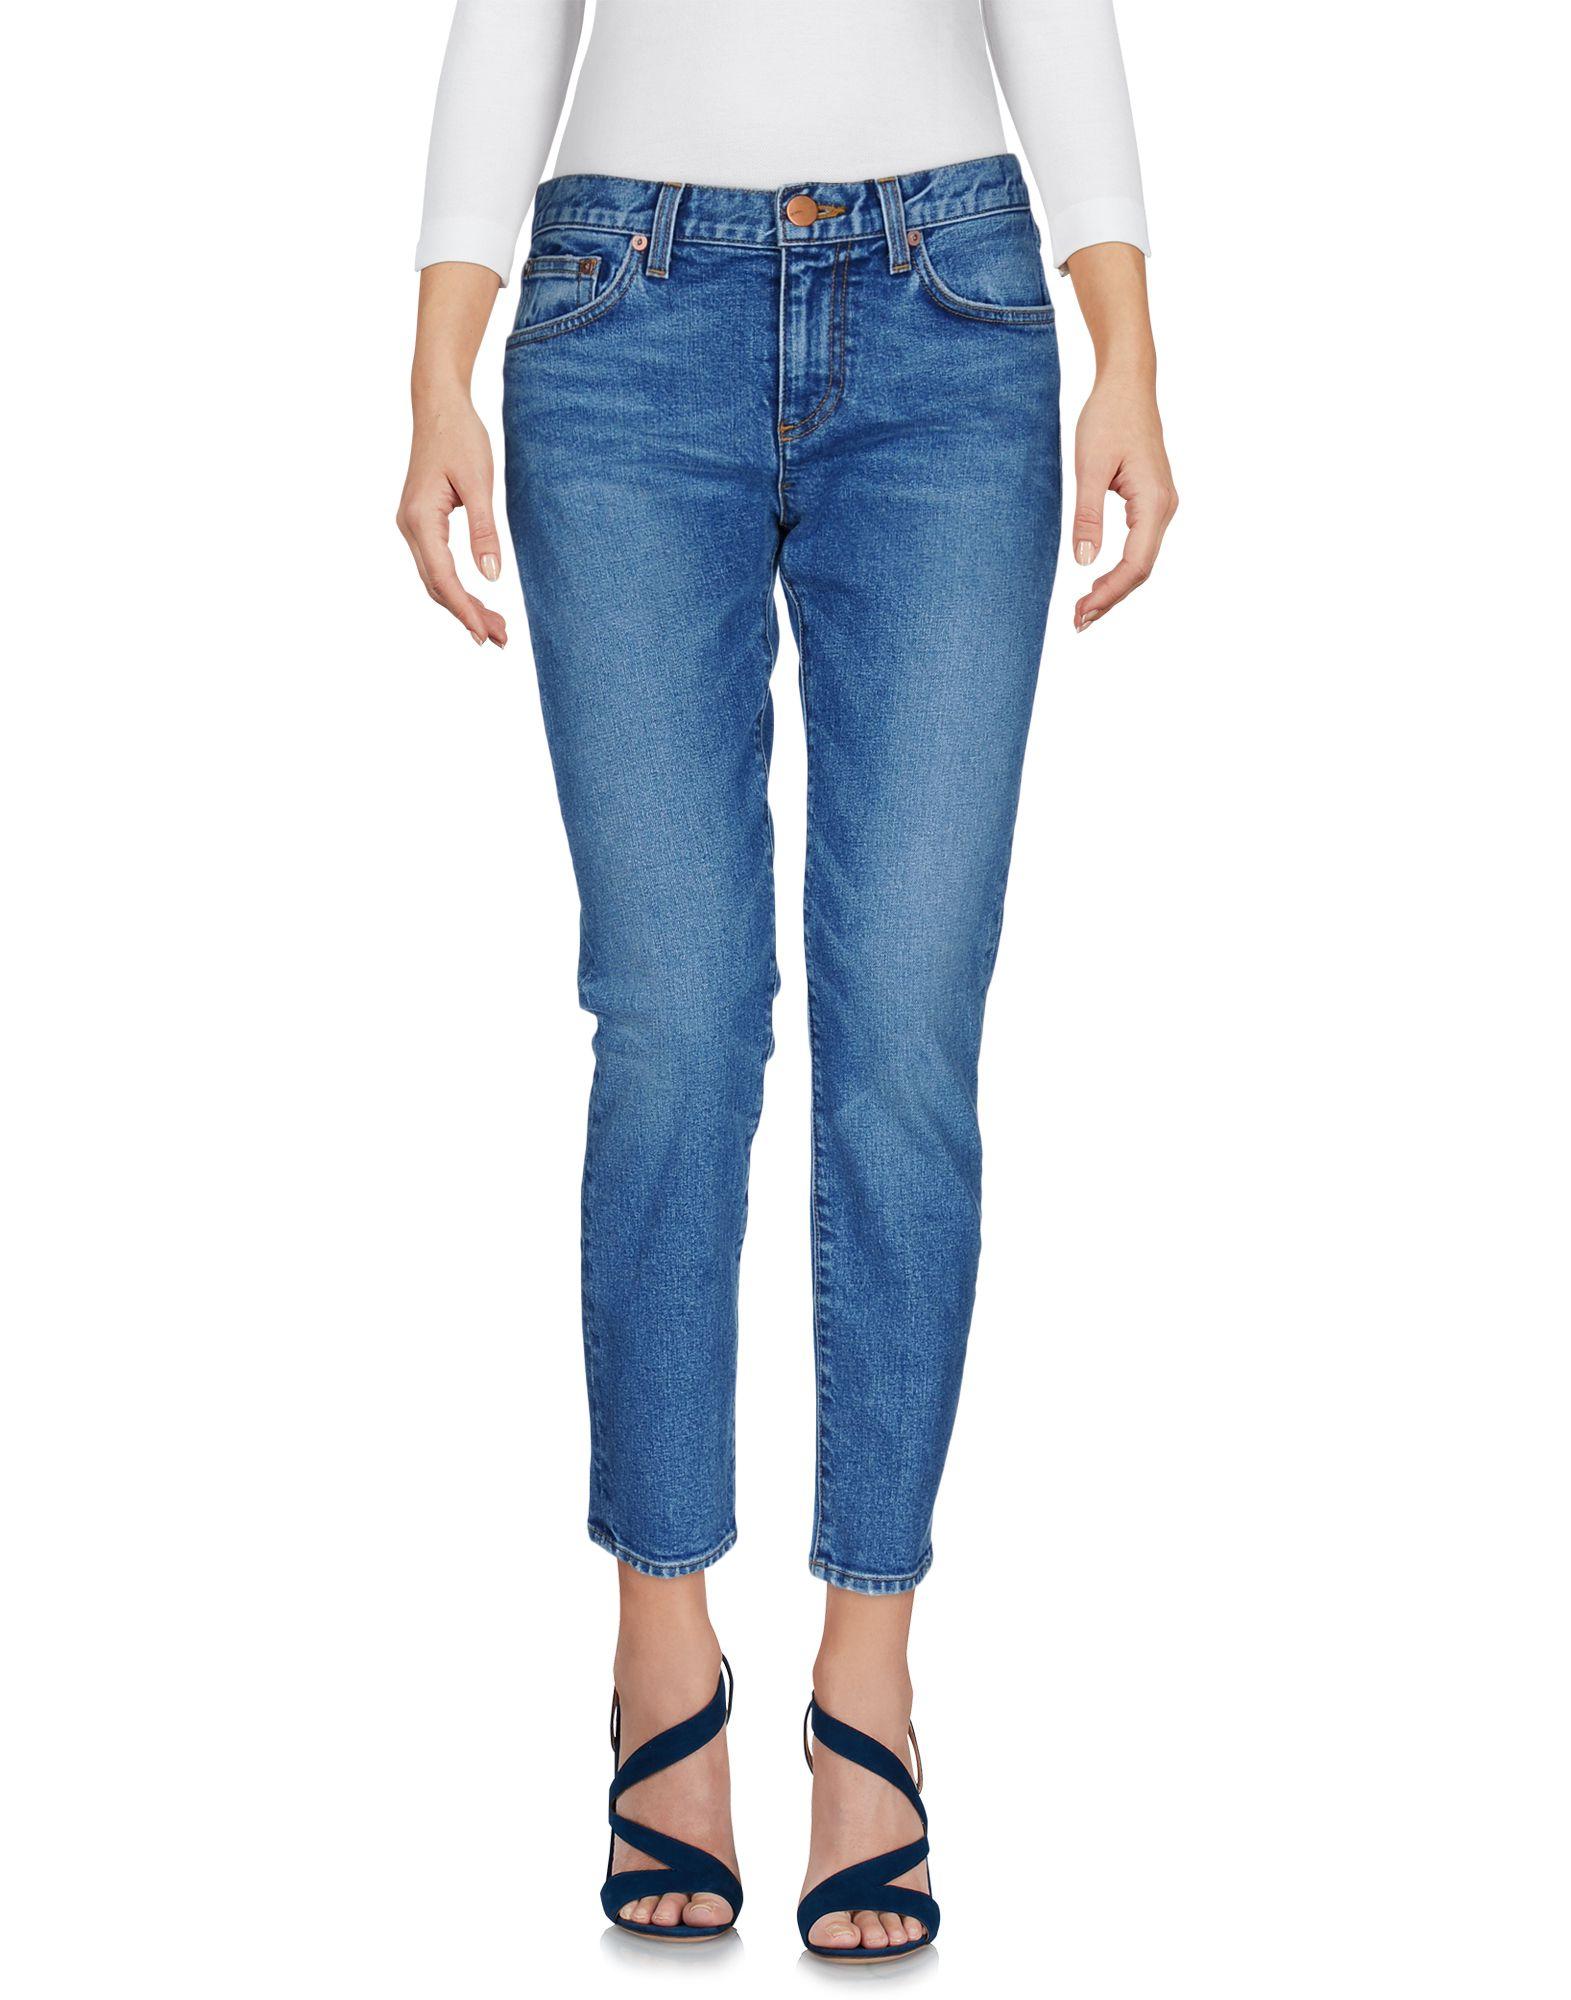 CRIPPEN Denim Pants in Blue